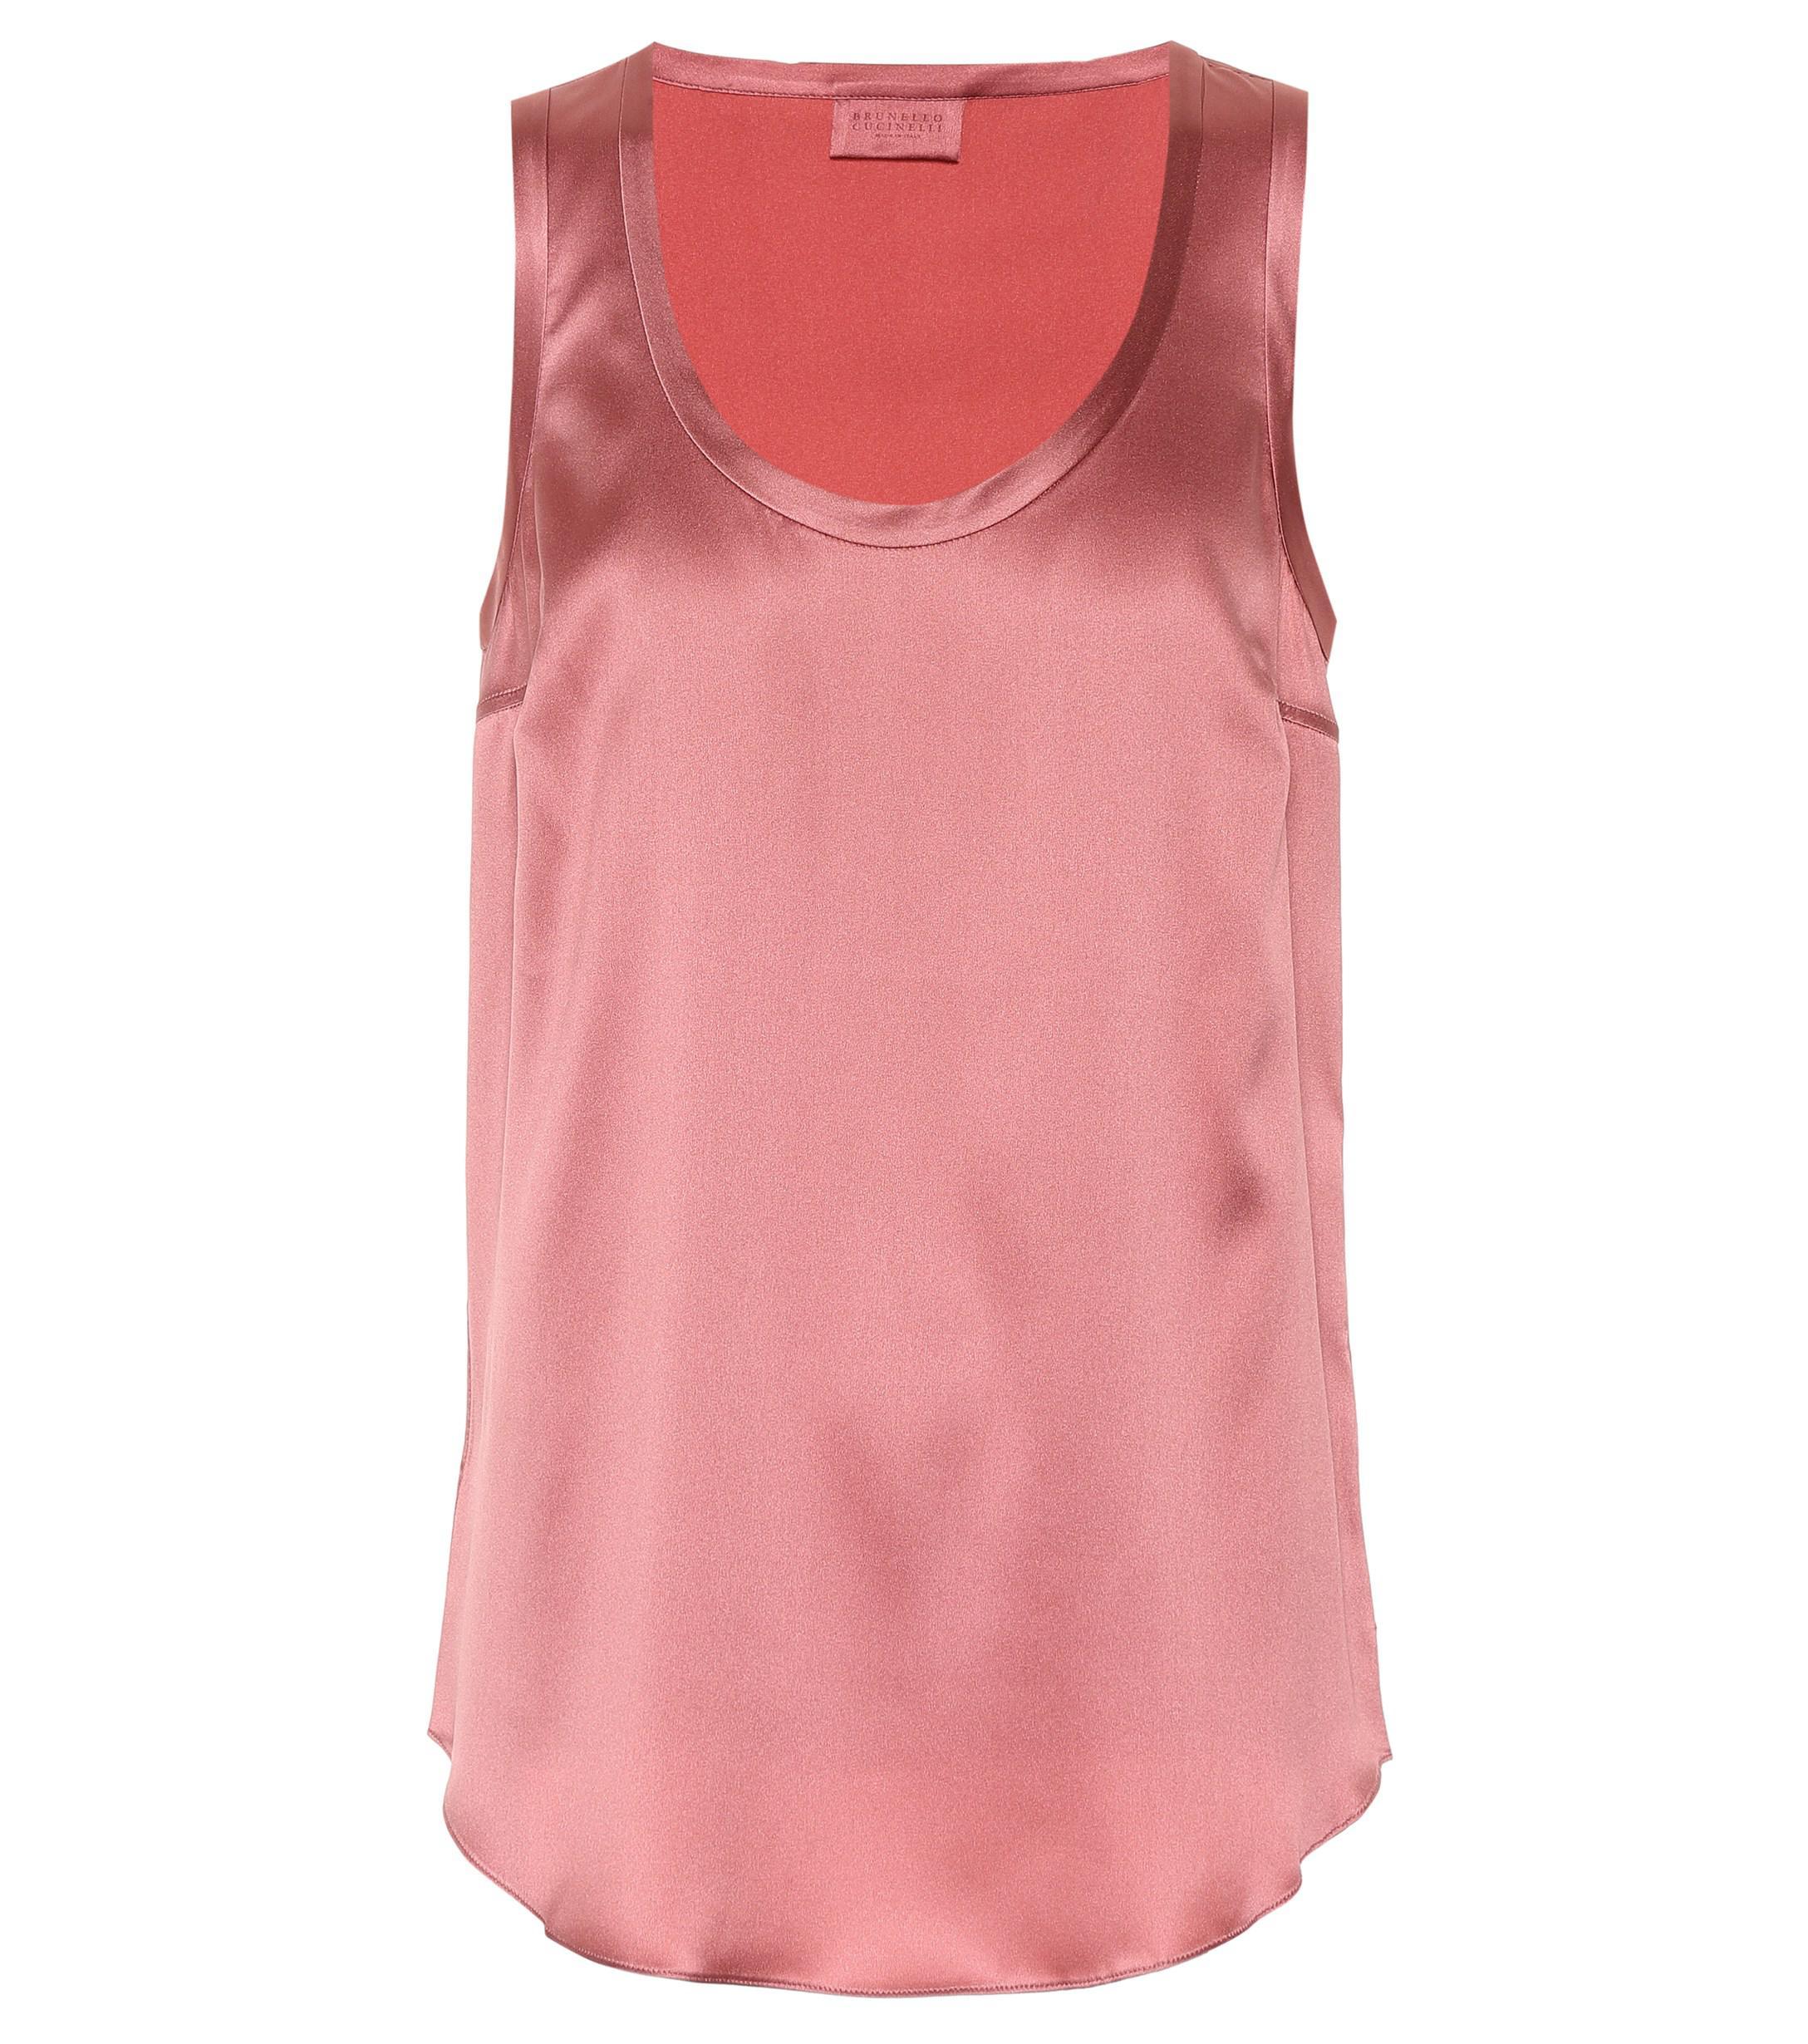 72594dc65285f Lyst - Brunello Cucinelli Stretch Silk Satin Top in Pink